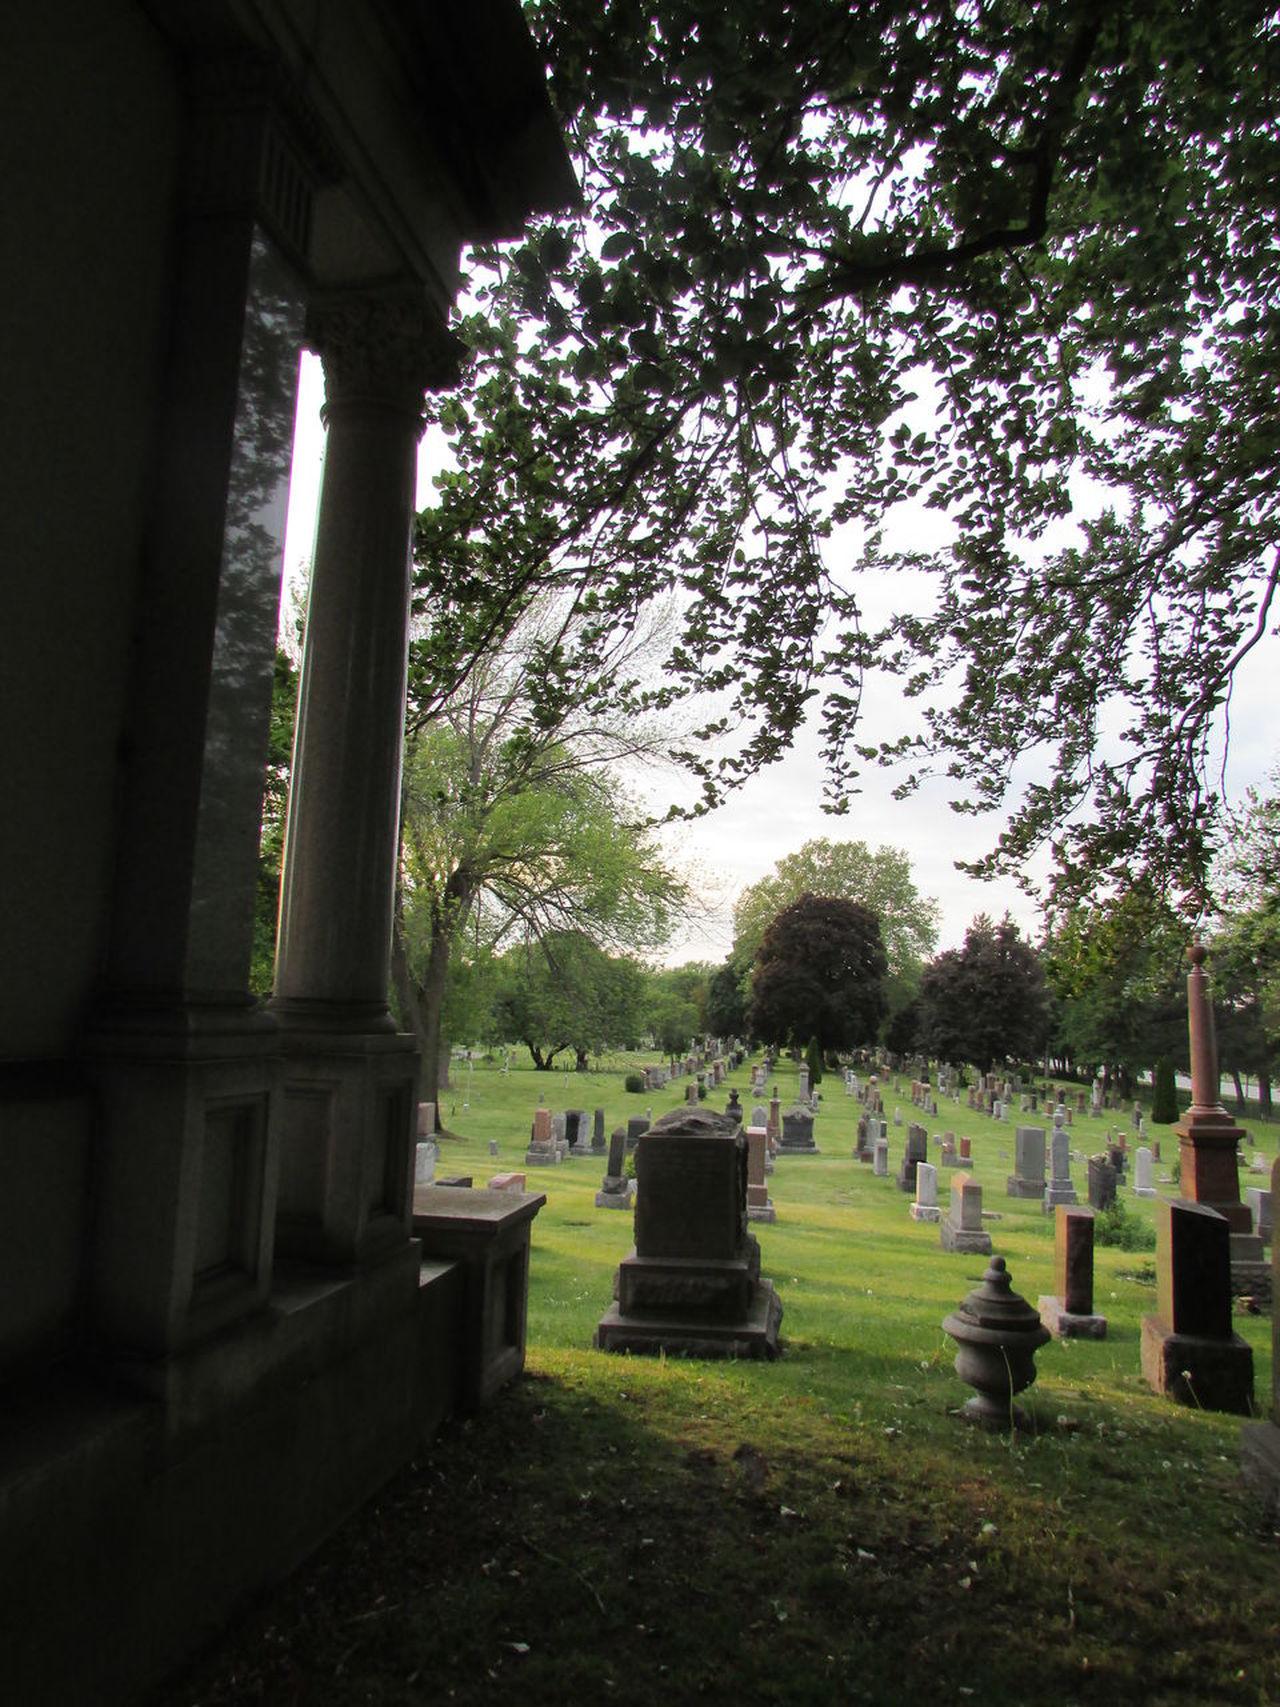 Cemetary Cemetary Beauty Gravestones Graveyard Graveyard Beauty Headstones Mausoleum No People Old Cemetery Old Graveyard Outdoors